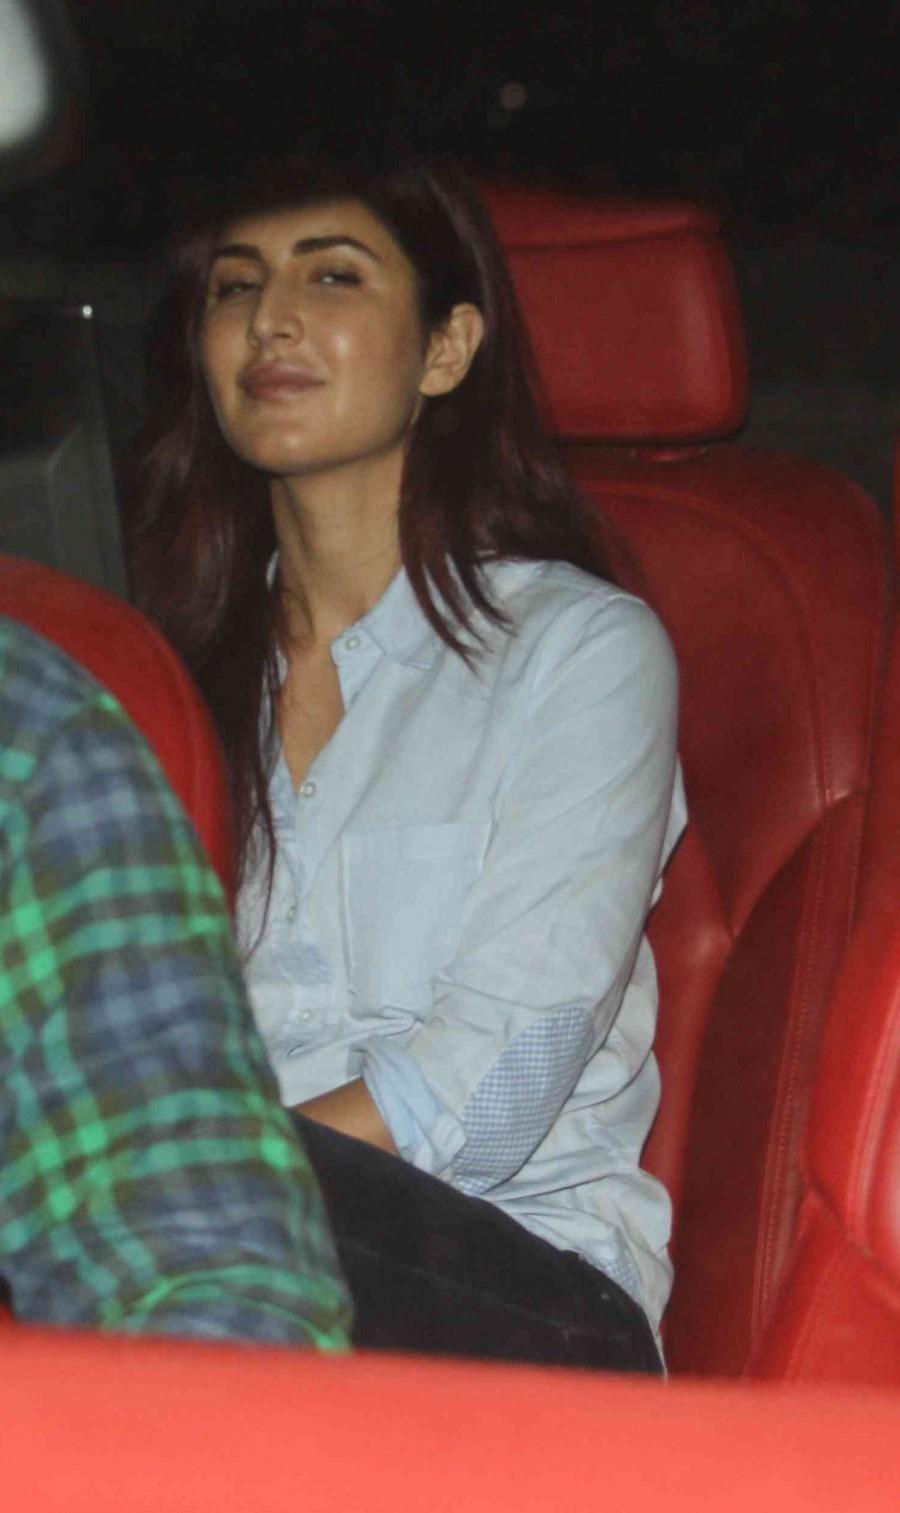 Ranbir Kapoor,katrina kaif,Deepika Padukone,neetu kapoor,kapoor family dinner,photos